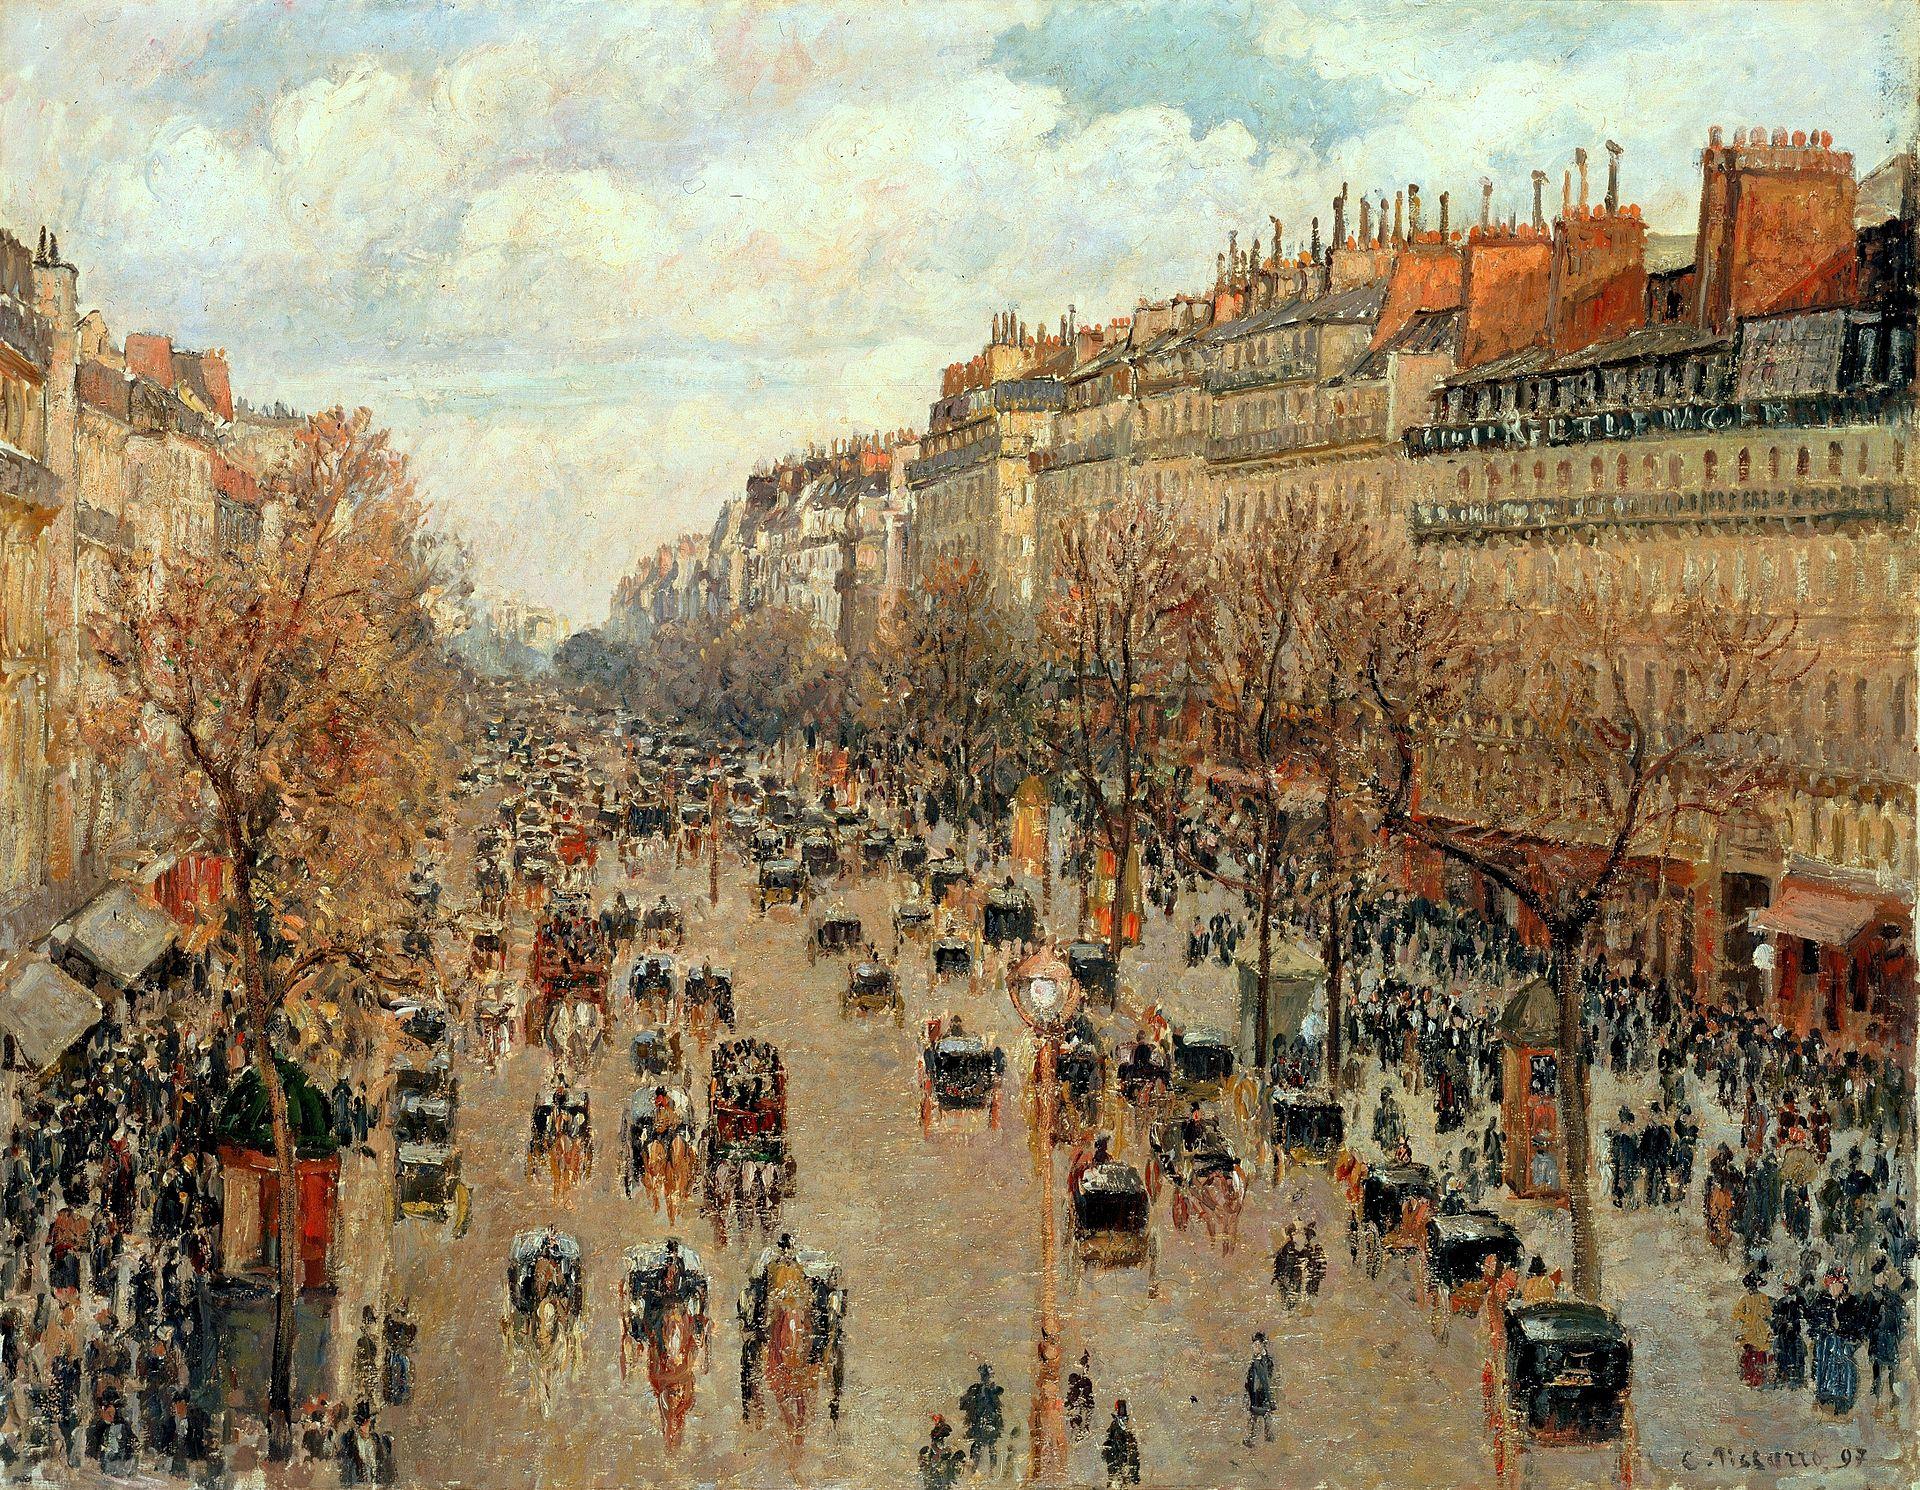 Camille Pissarro,  Boulevard Montmartre , 1897, the Hermitage, Saint Petersburg.